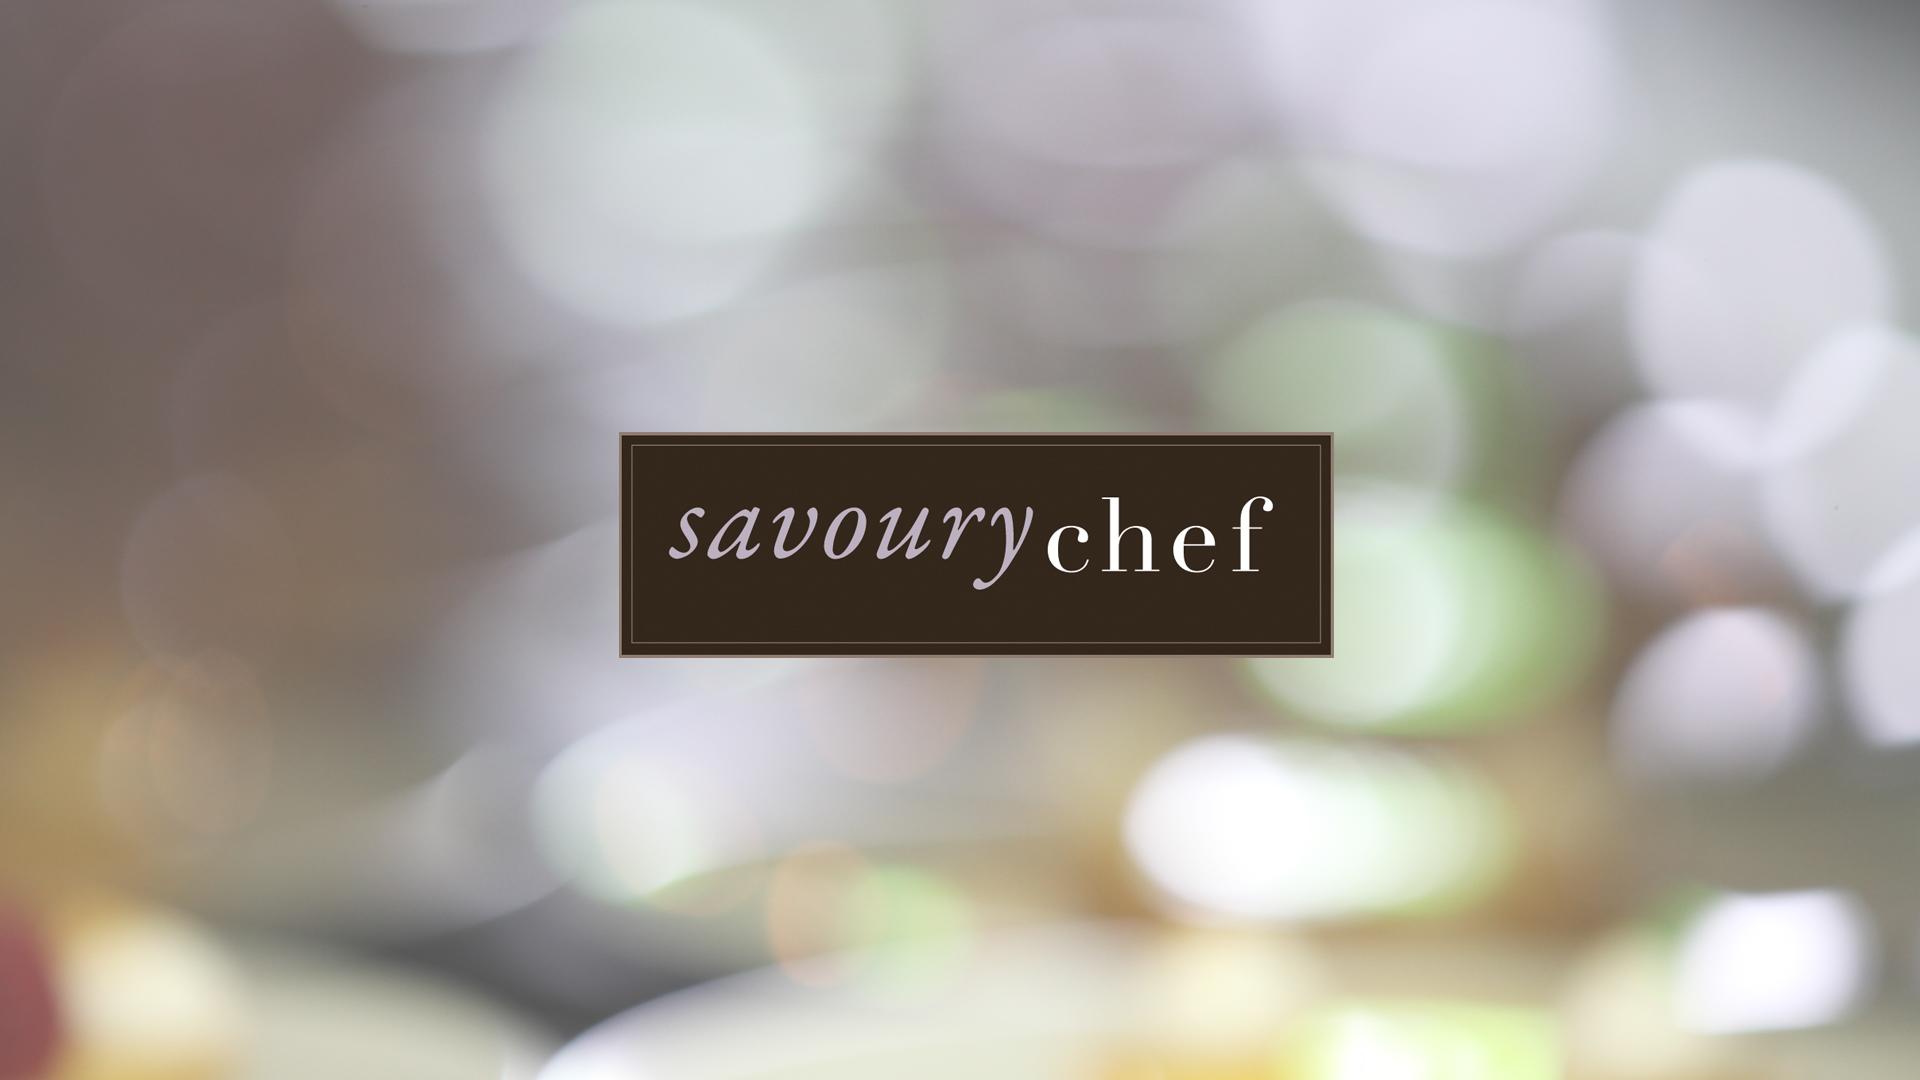 savoury-chef